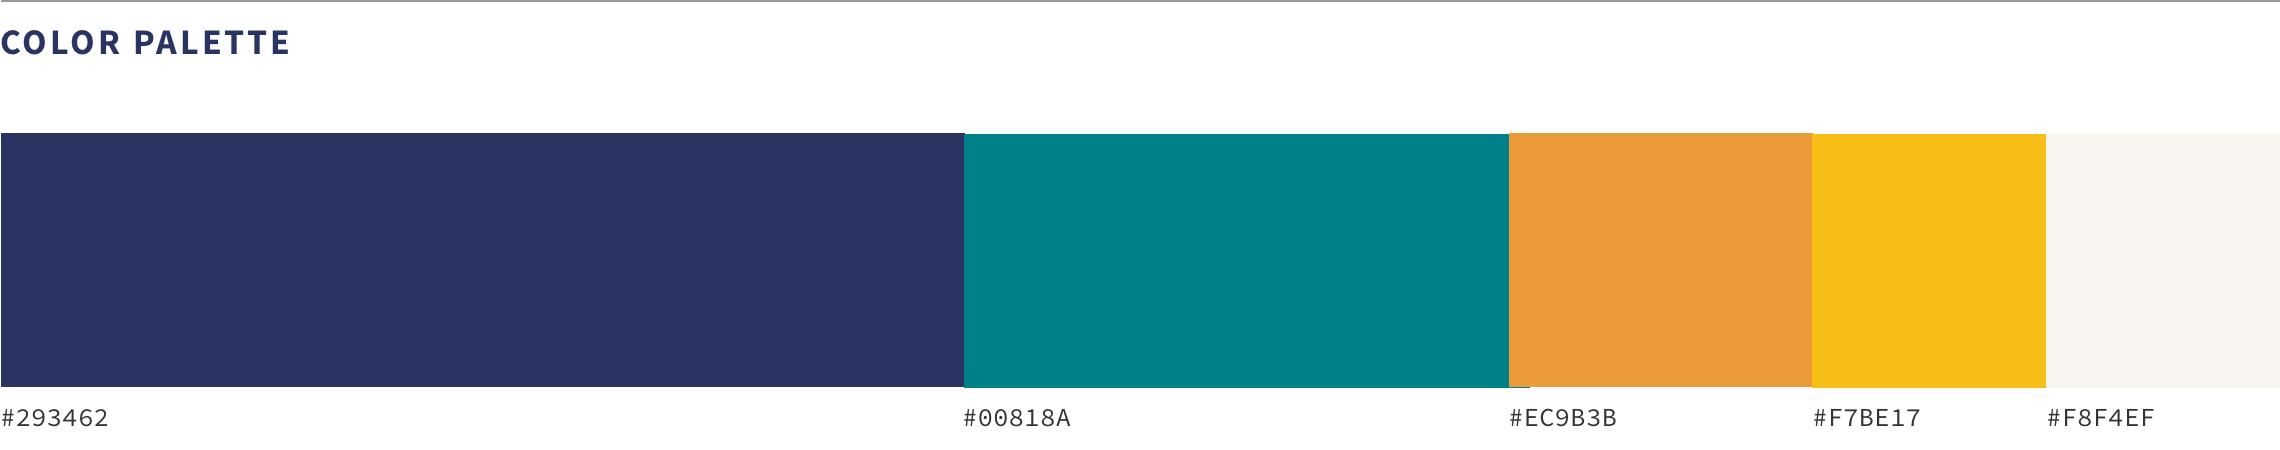 Center For Humane Technology Color Palette